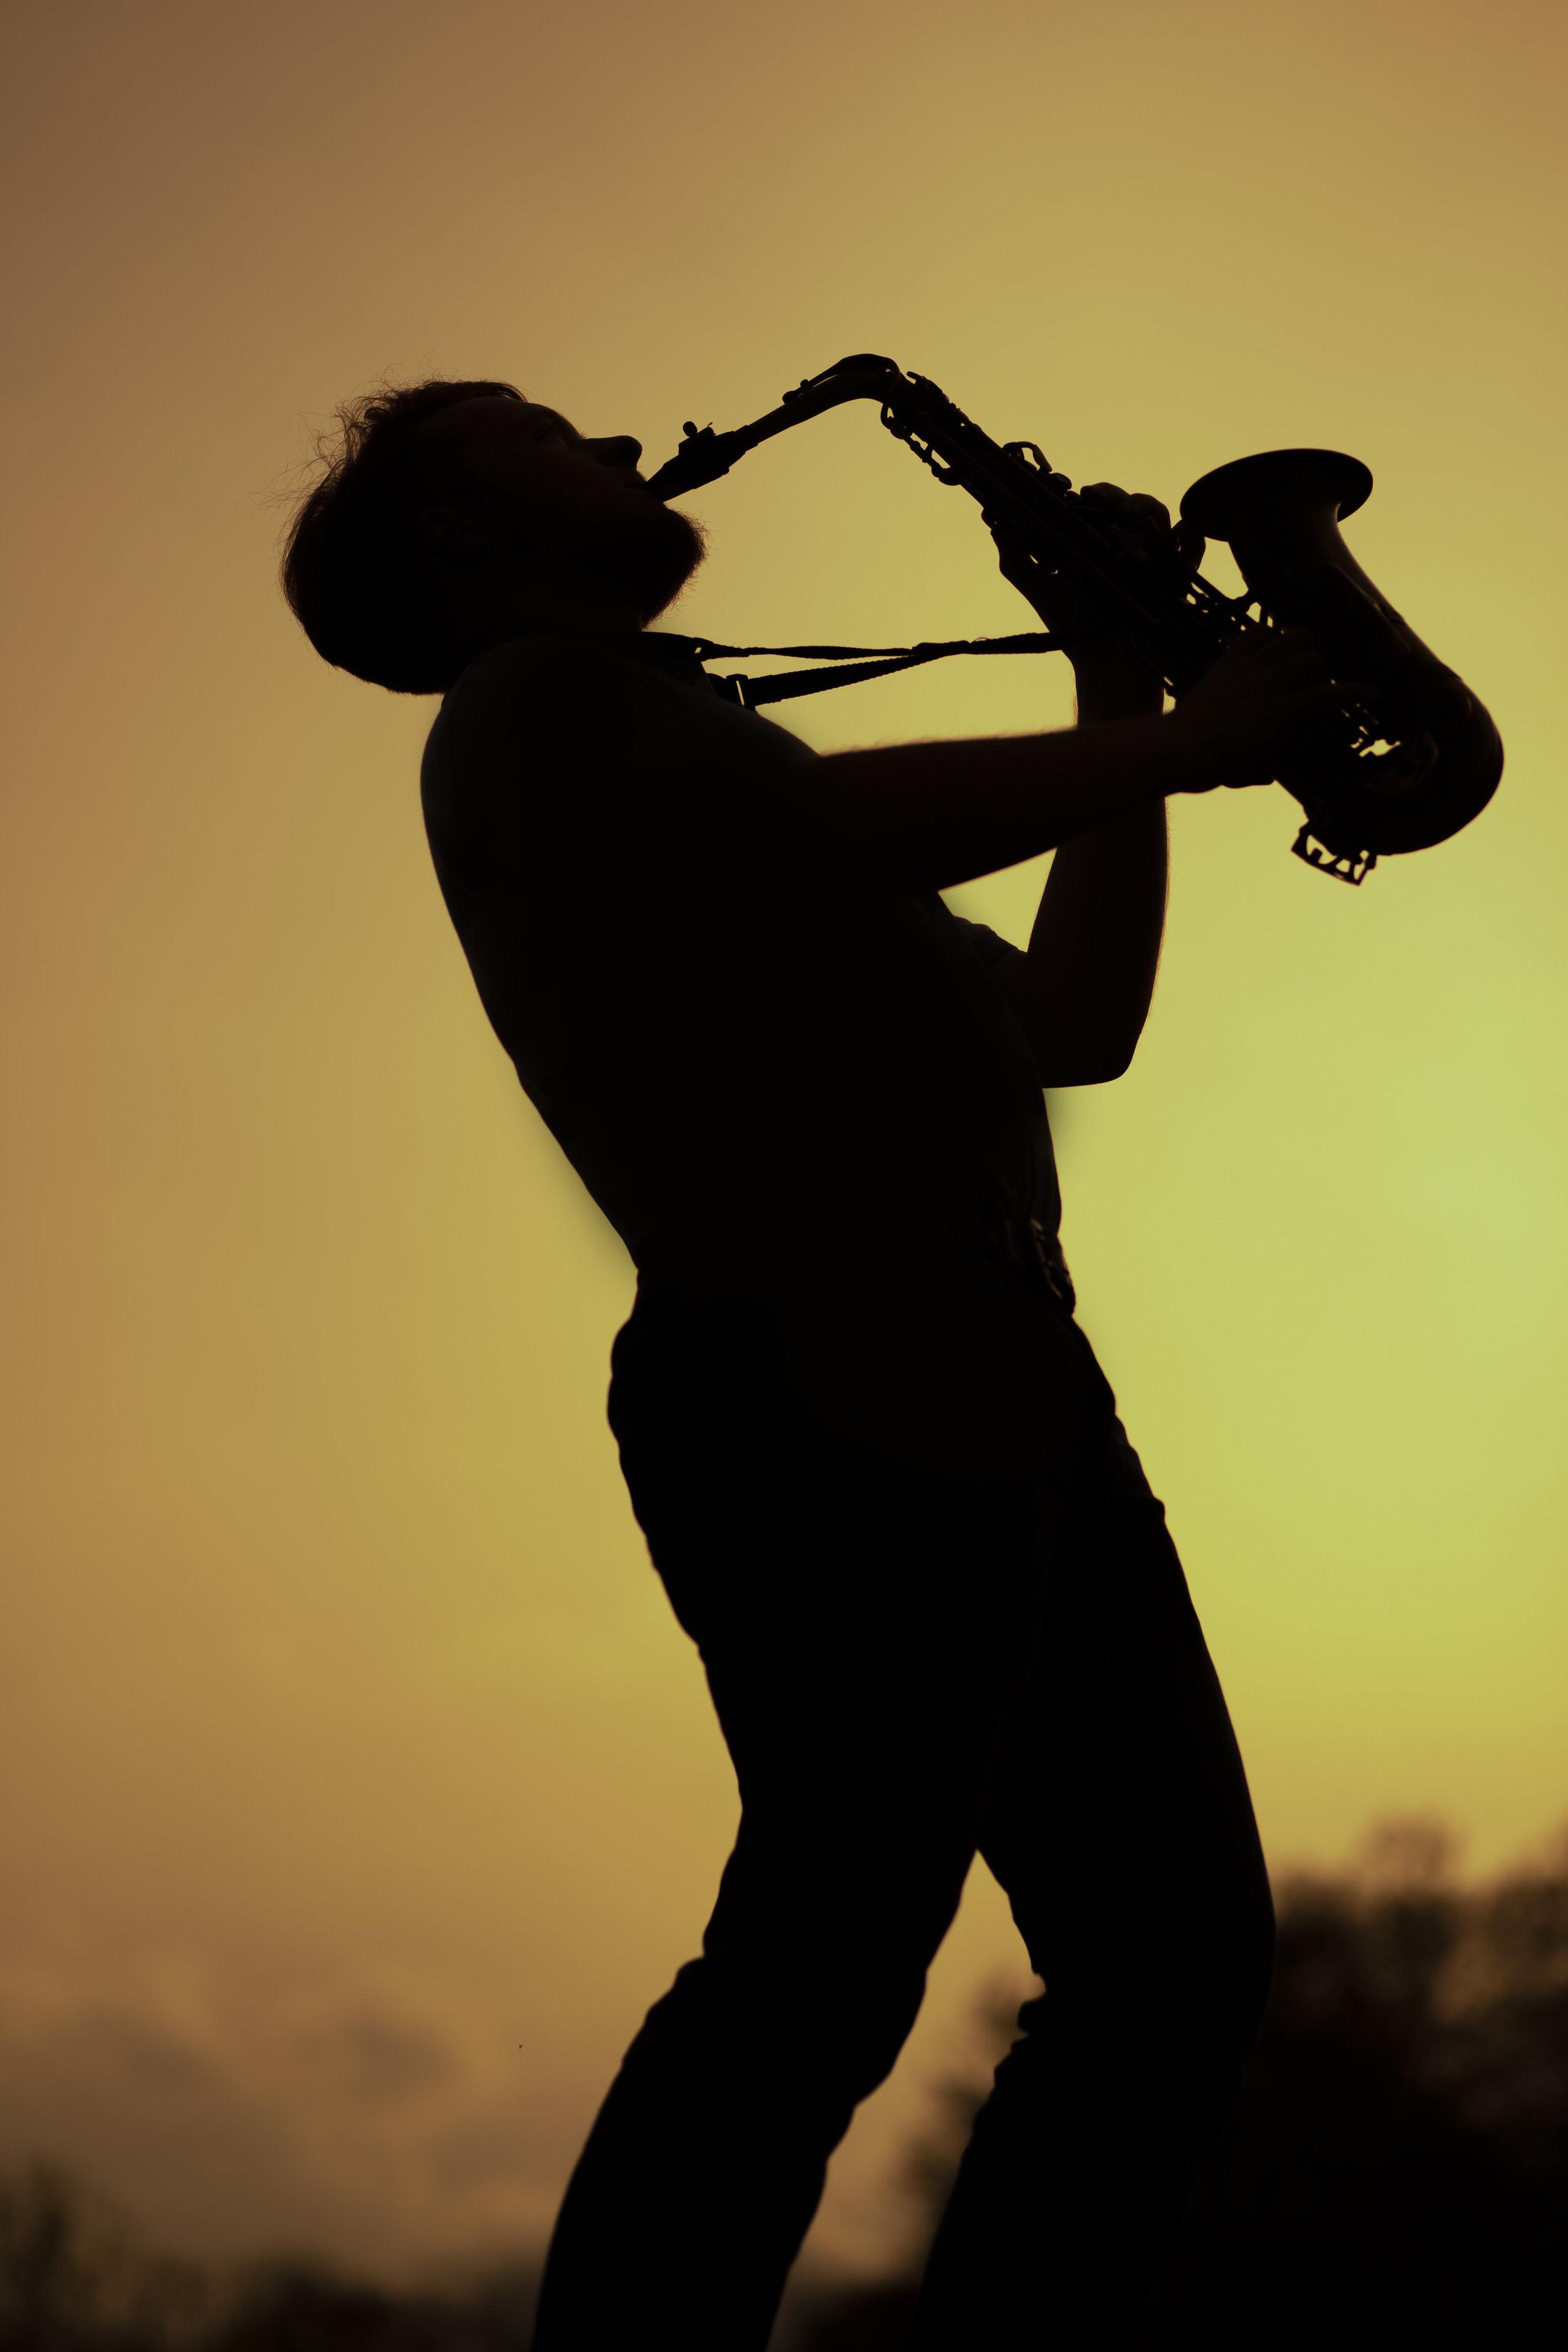 pickens sc senior portraits  senior photographer pickens sc  hagood mill pickens sc  saxophone